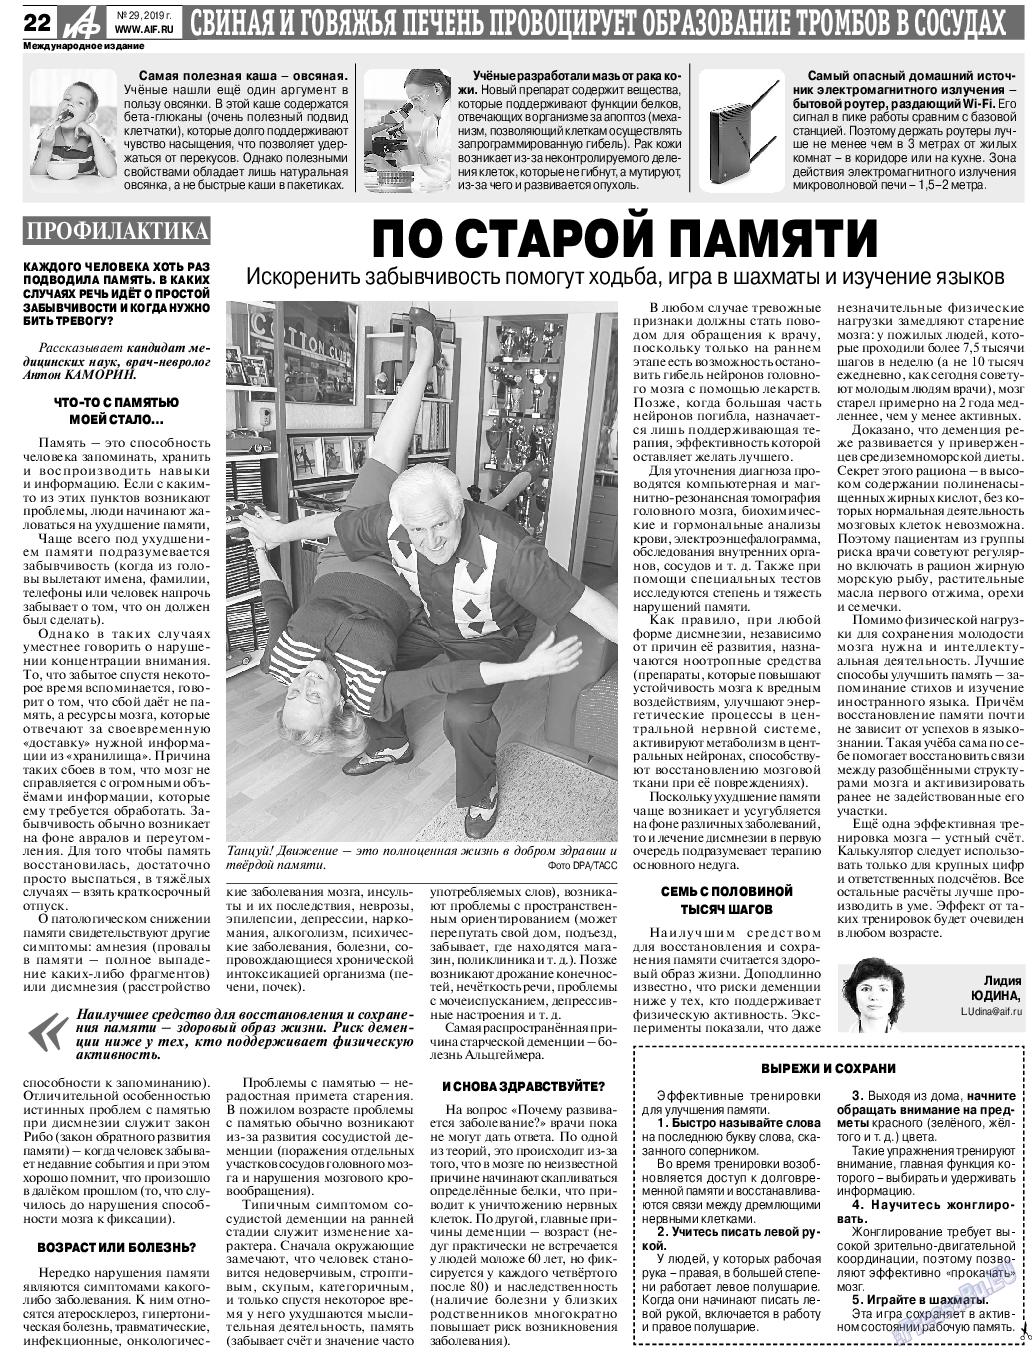 Аргументы и факты Европа (газета). 2019 год, номер 29, стр. 22